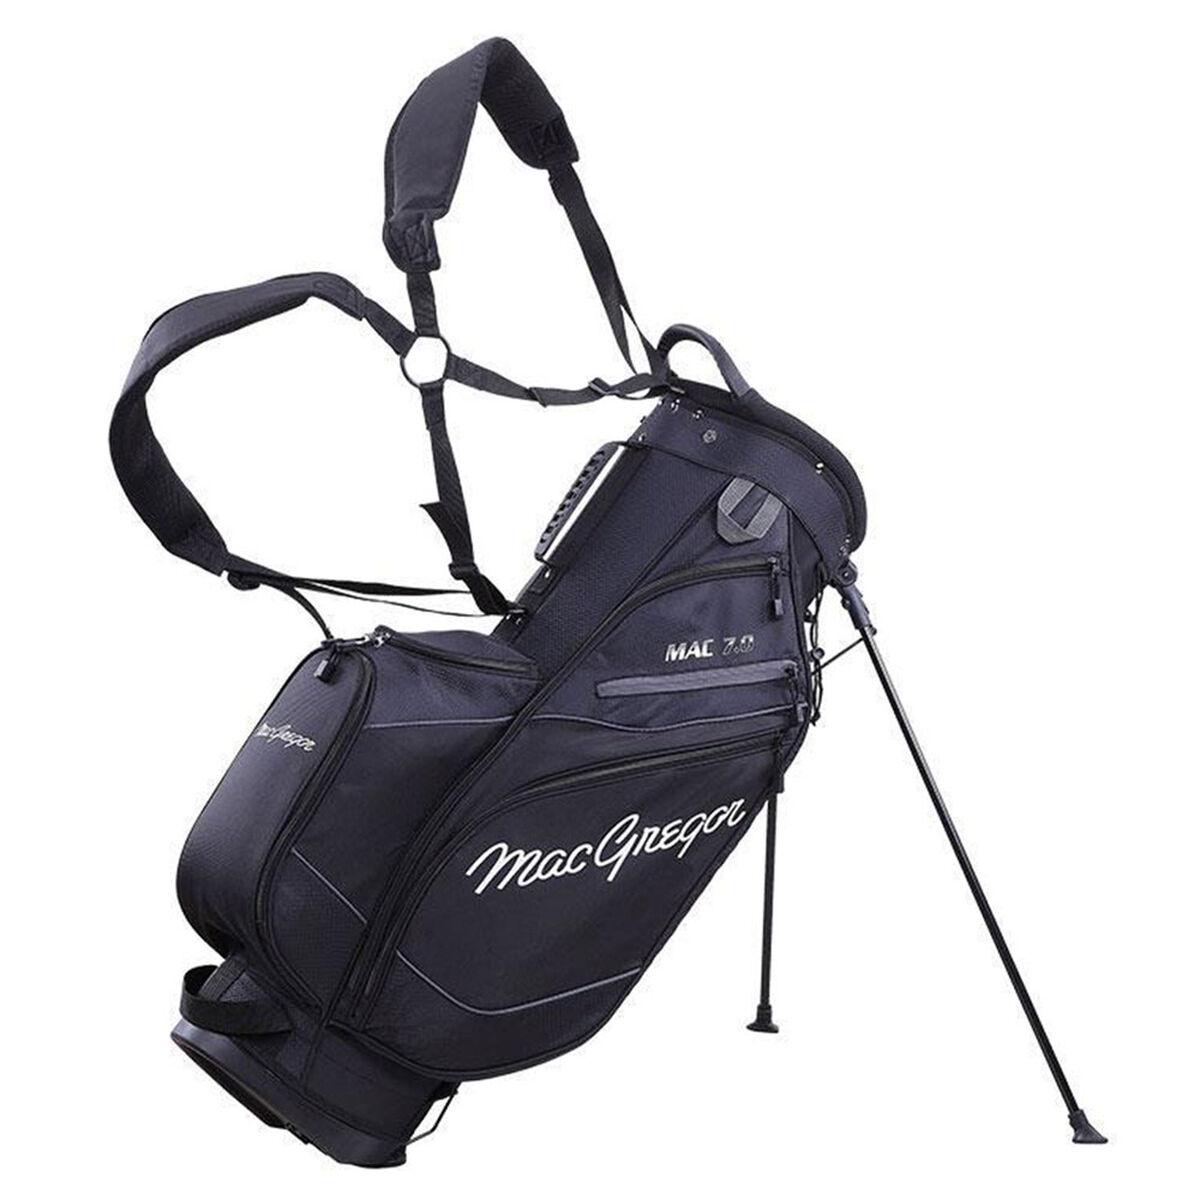 MacGregor MAC 7.0 Golf Stand Bag, Black   American Golf